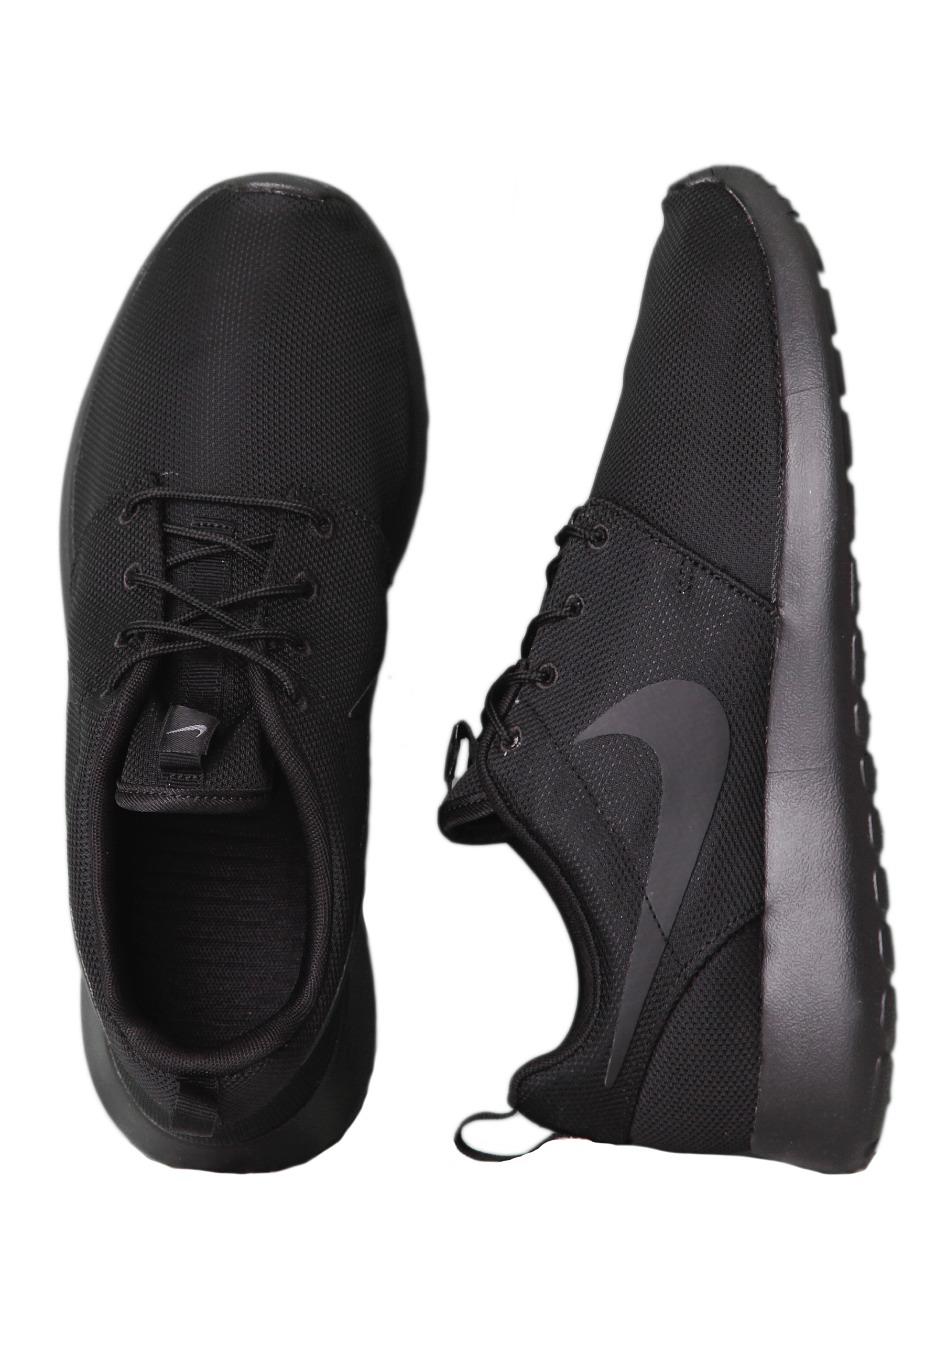 nike roshe run black black shoes worldwide. Black Bedroom Furniture Sets. Home Design Ideas